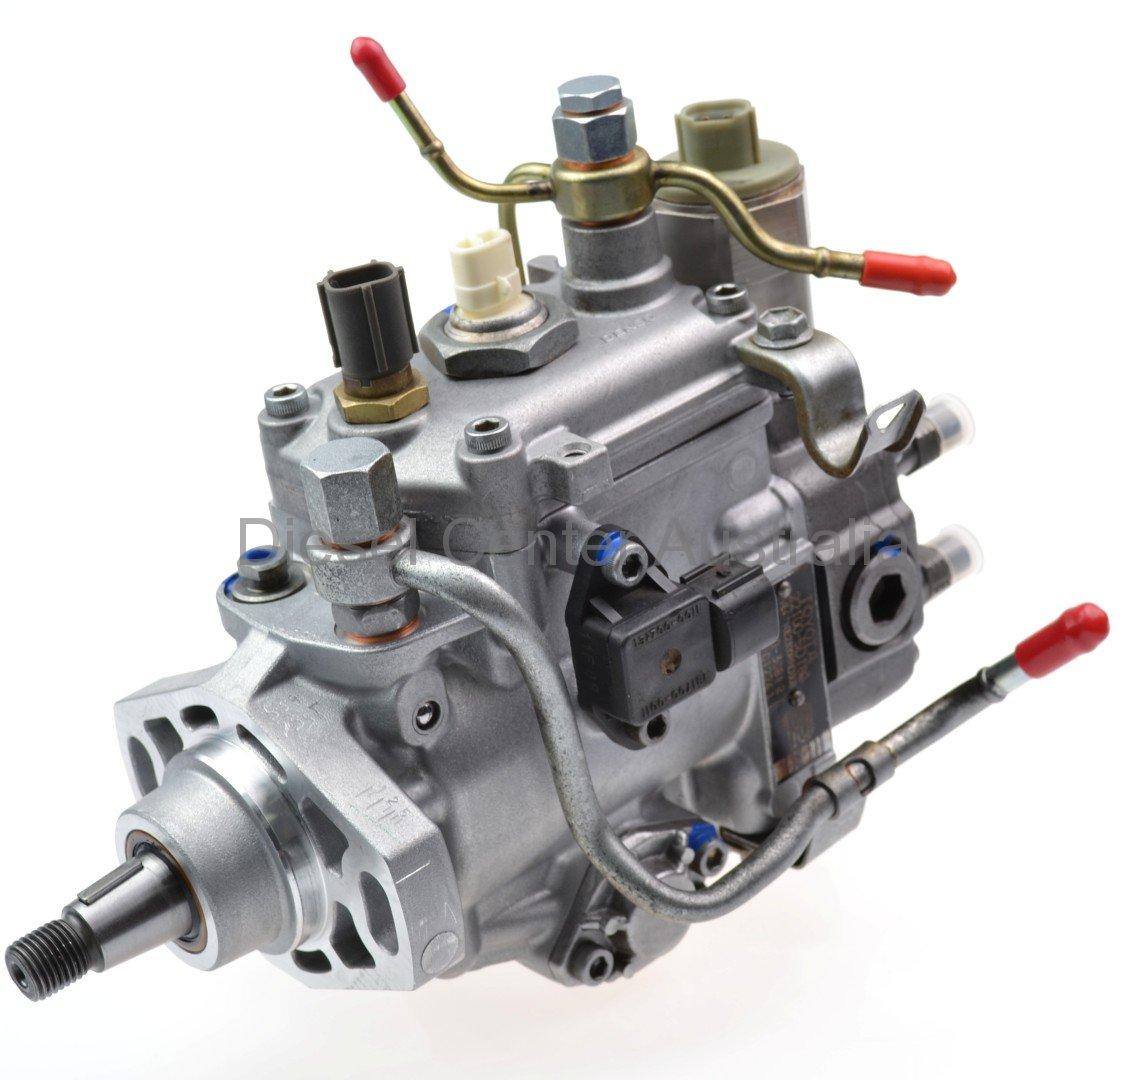 John Deere 6420 Wiring Diagram Diesel Injectors Injection Pumps Outstanding Rebuilds